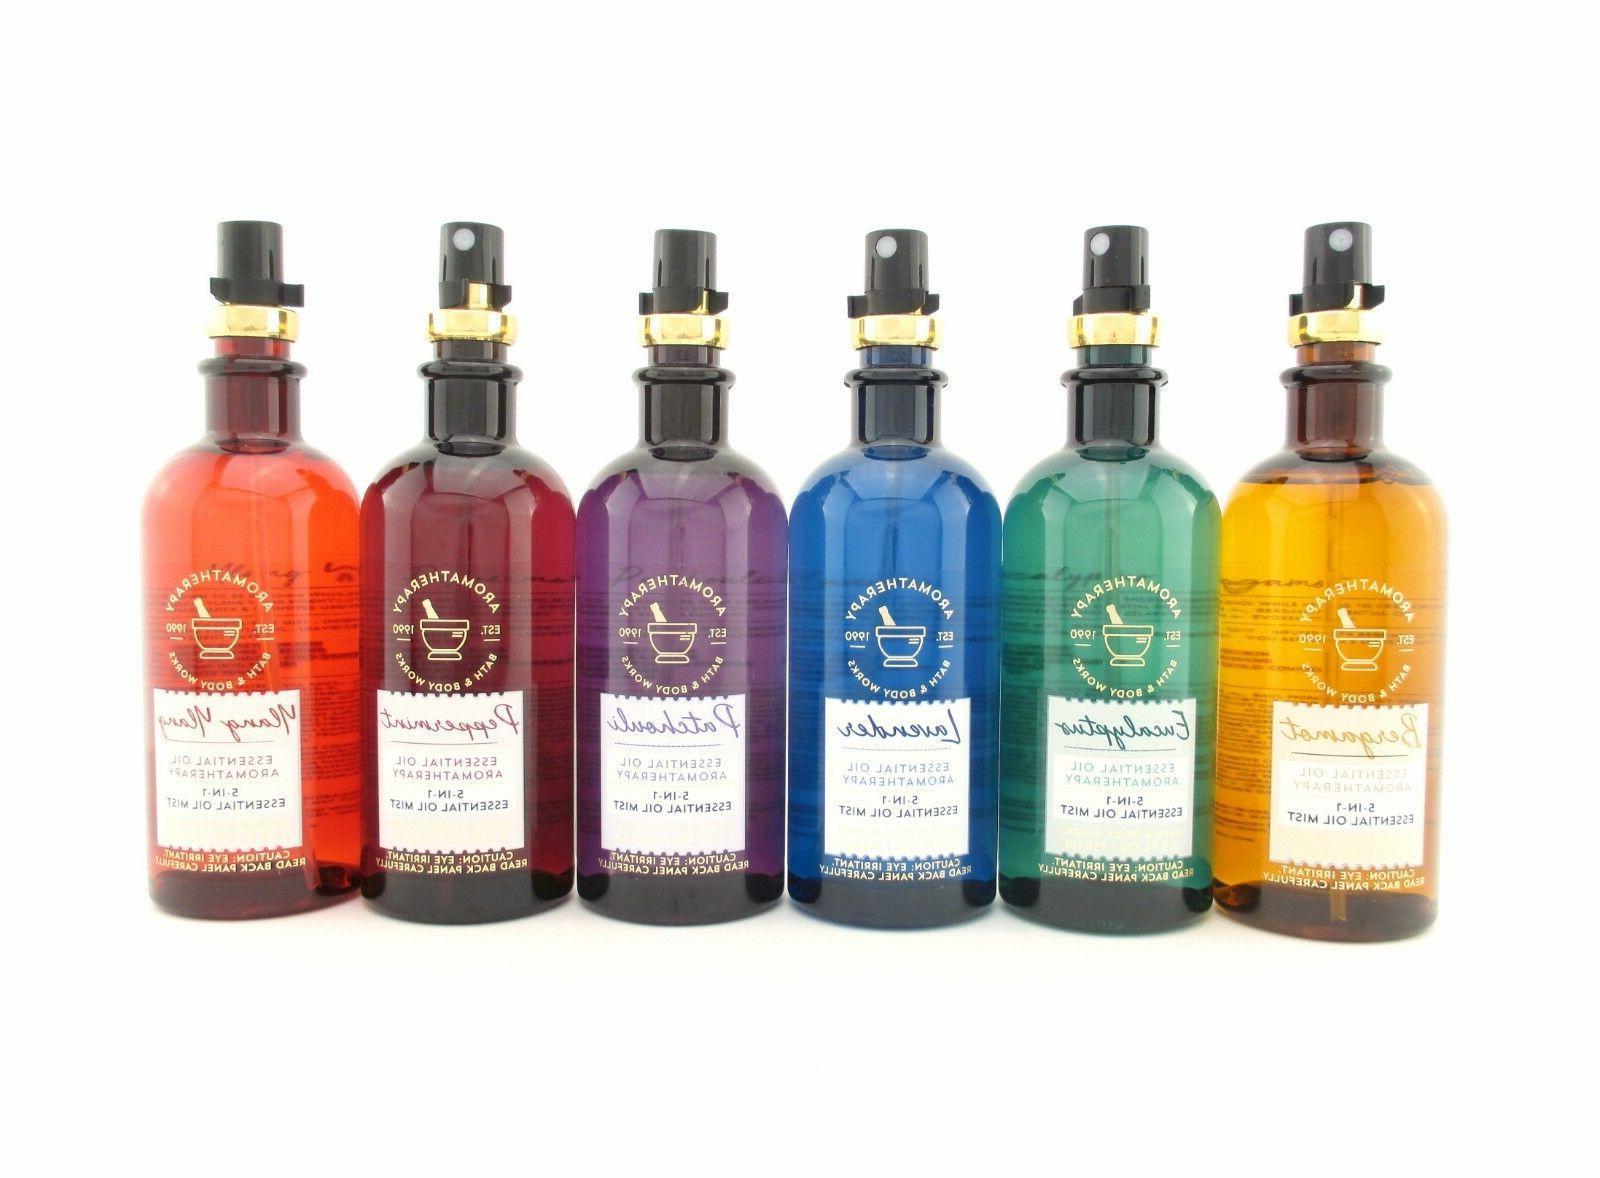 Bath Body Works Aromatherapy Essential Oil 5 in 1 Mist 5.3 o